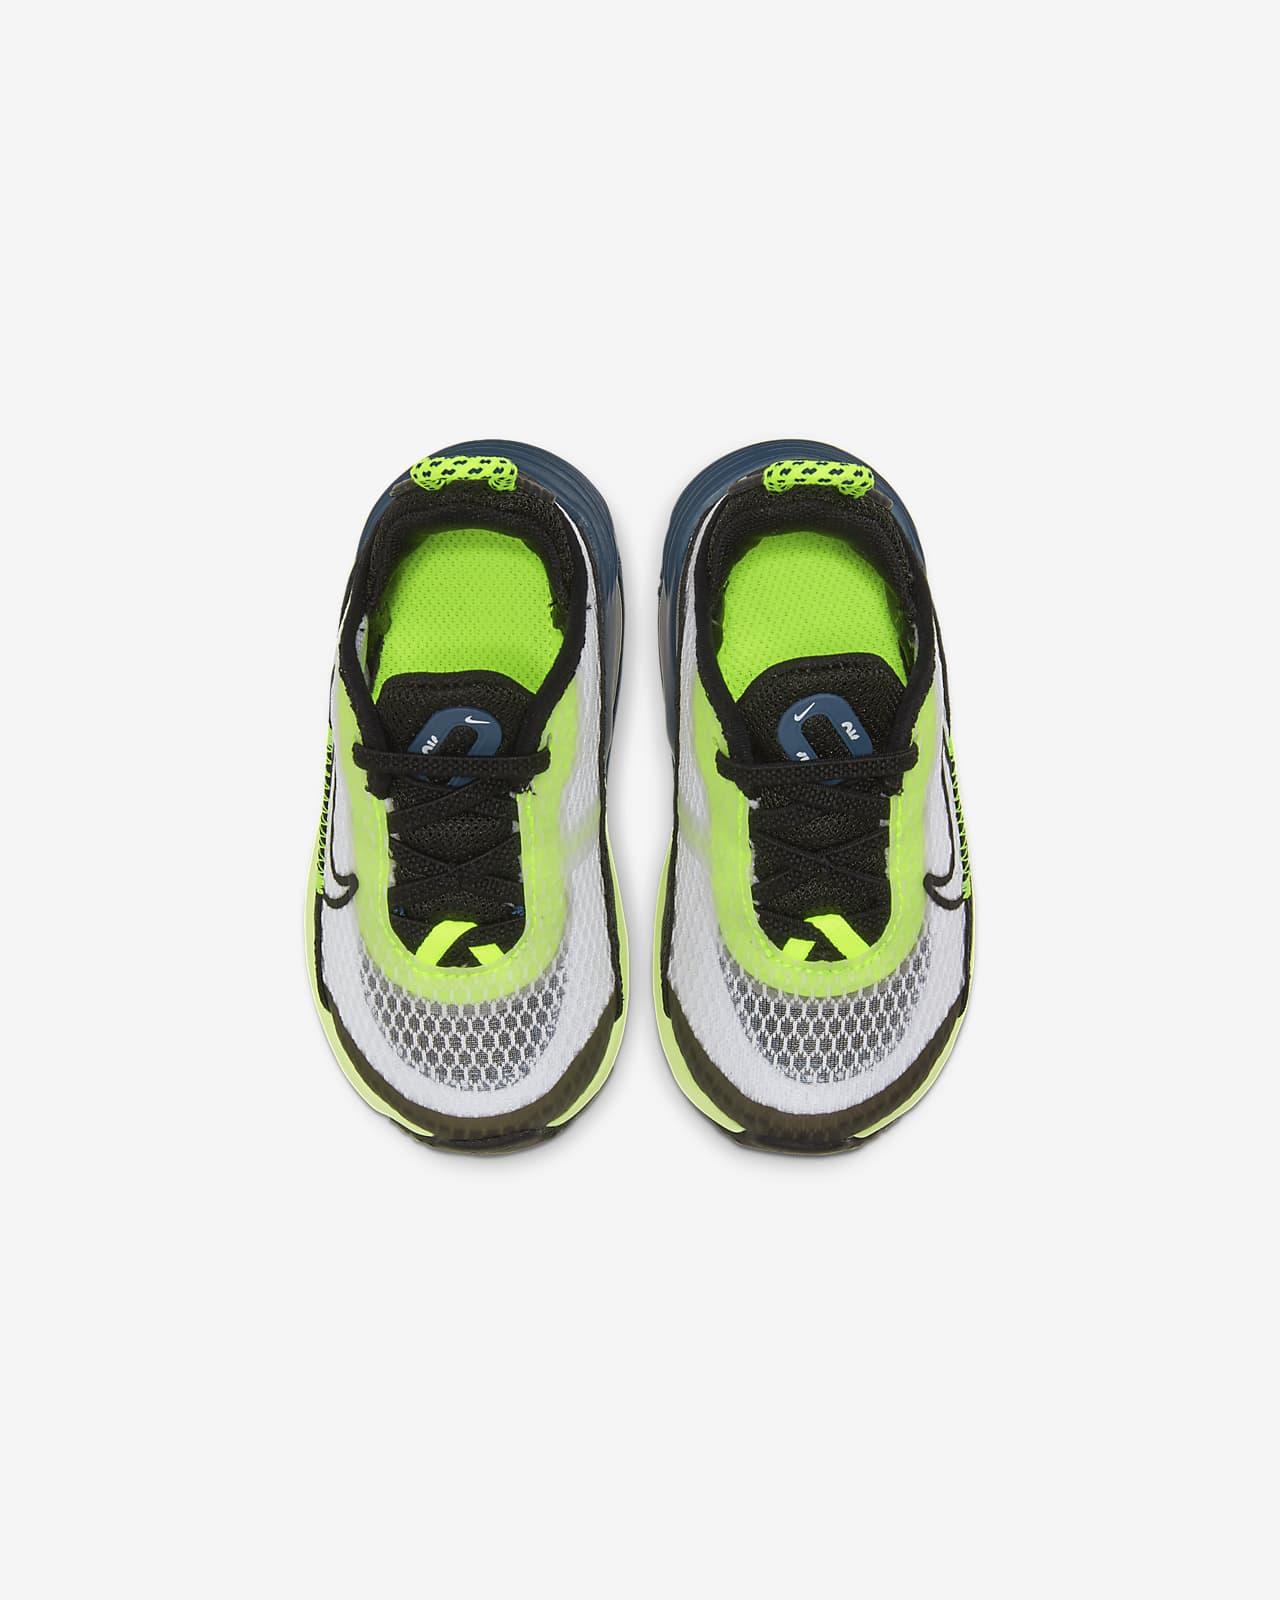 Scarpa Nike Air Max 2090 - Neonati/Bimbi piccoli